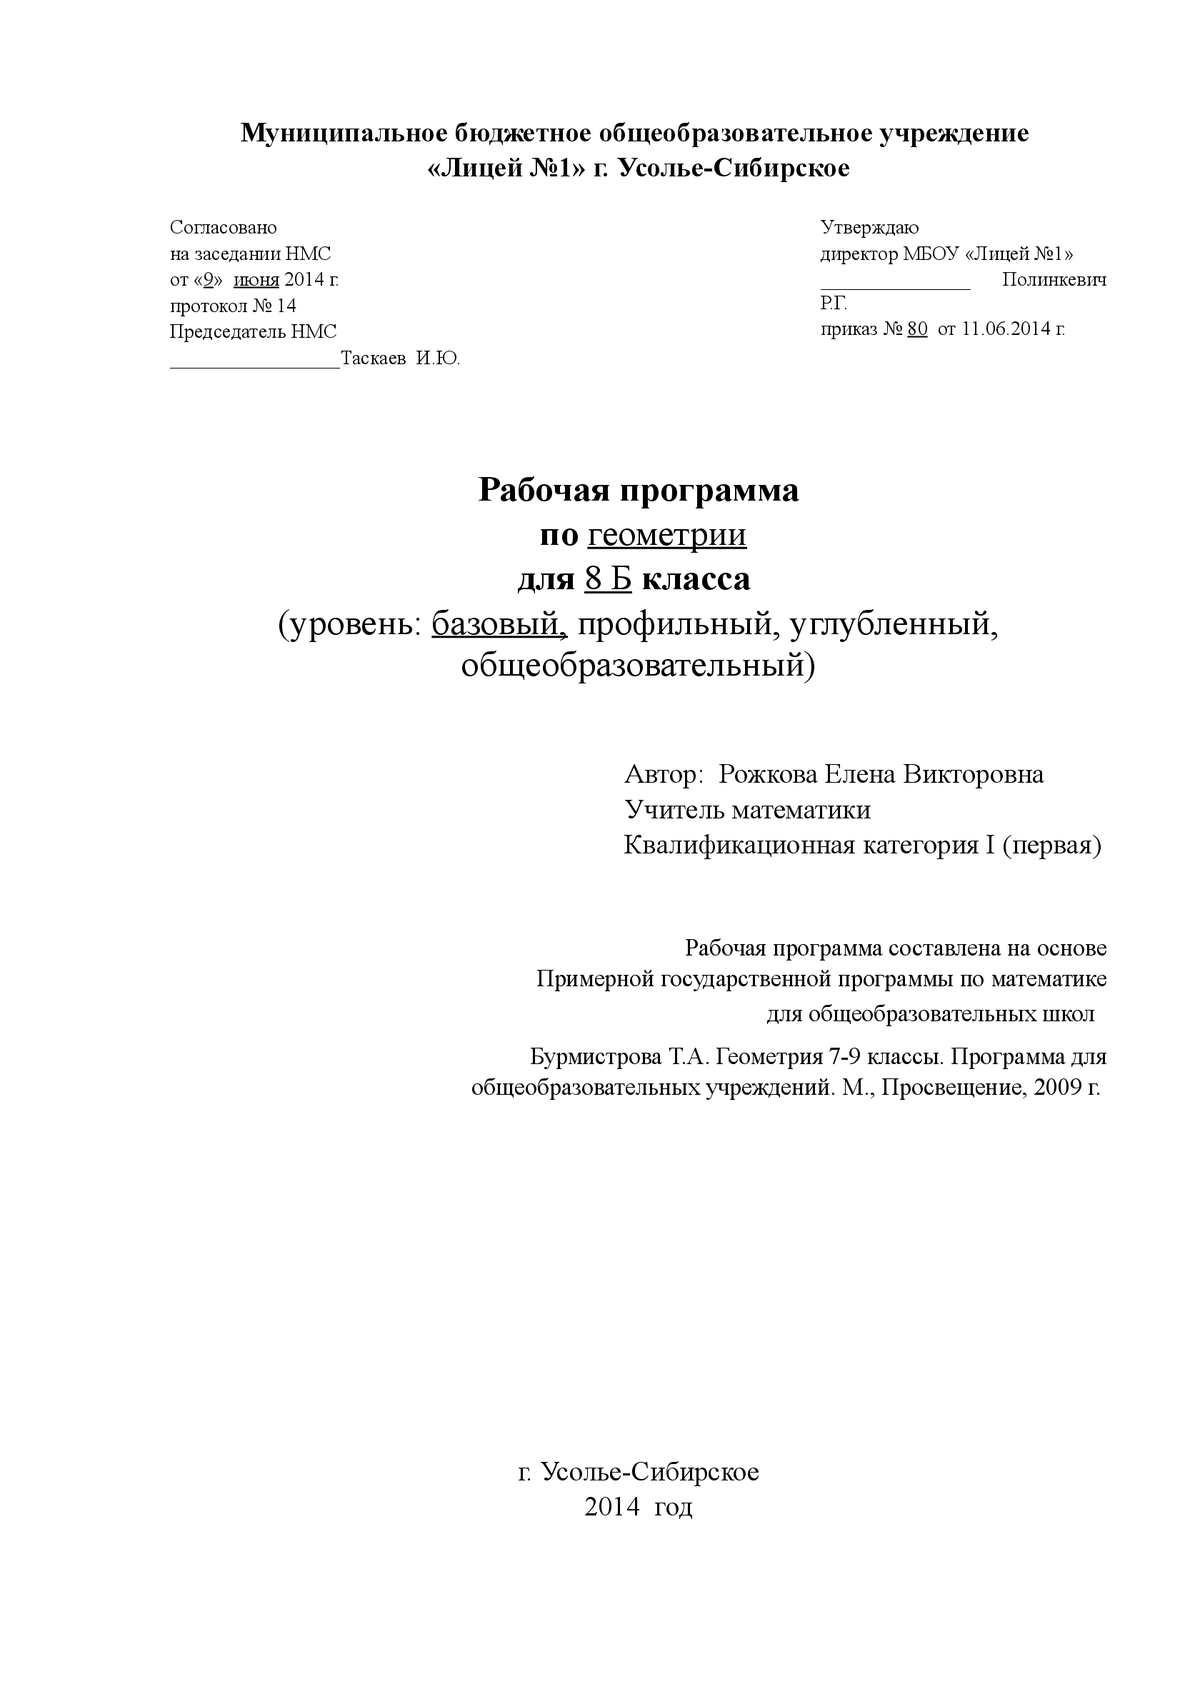 Рабочая программа по геометрии класс УМК Атанасян